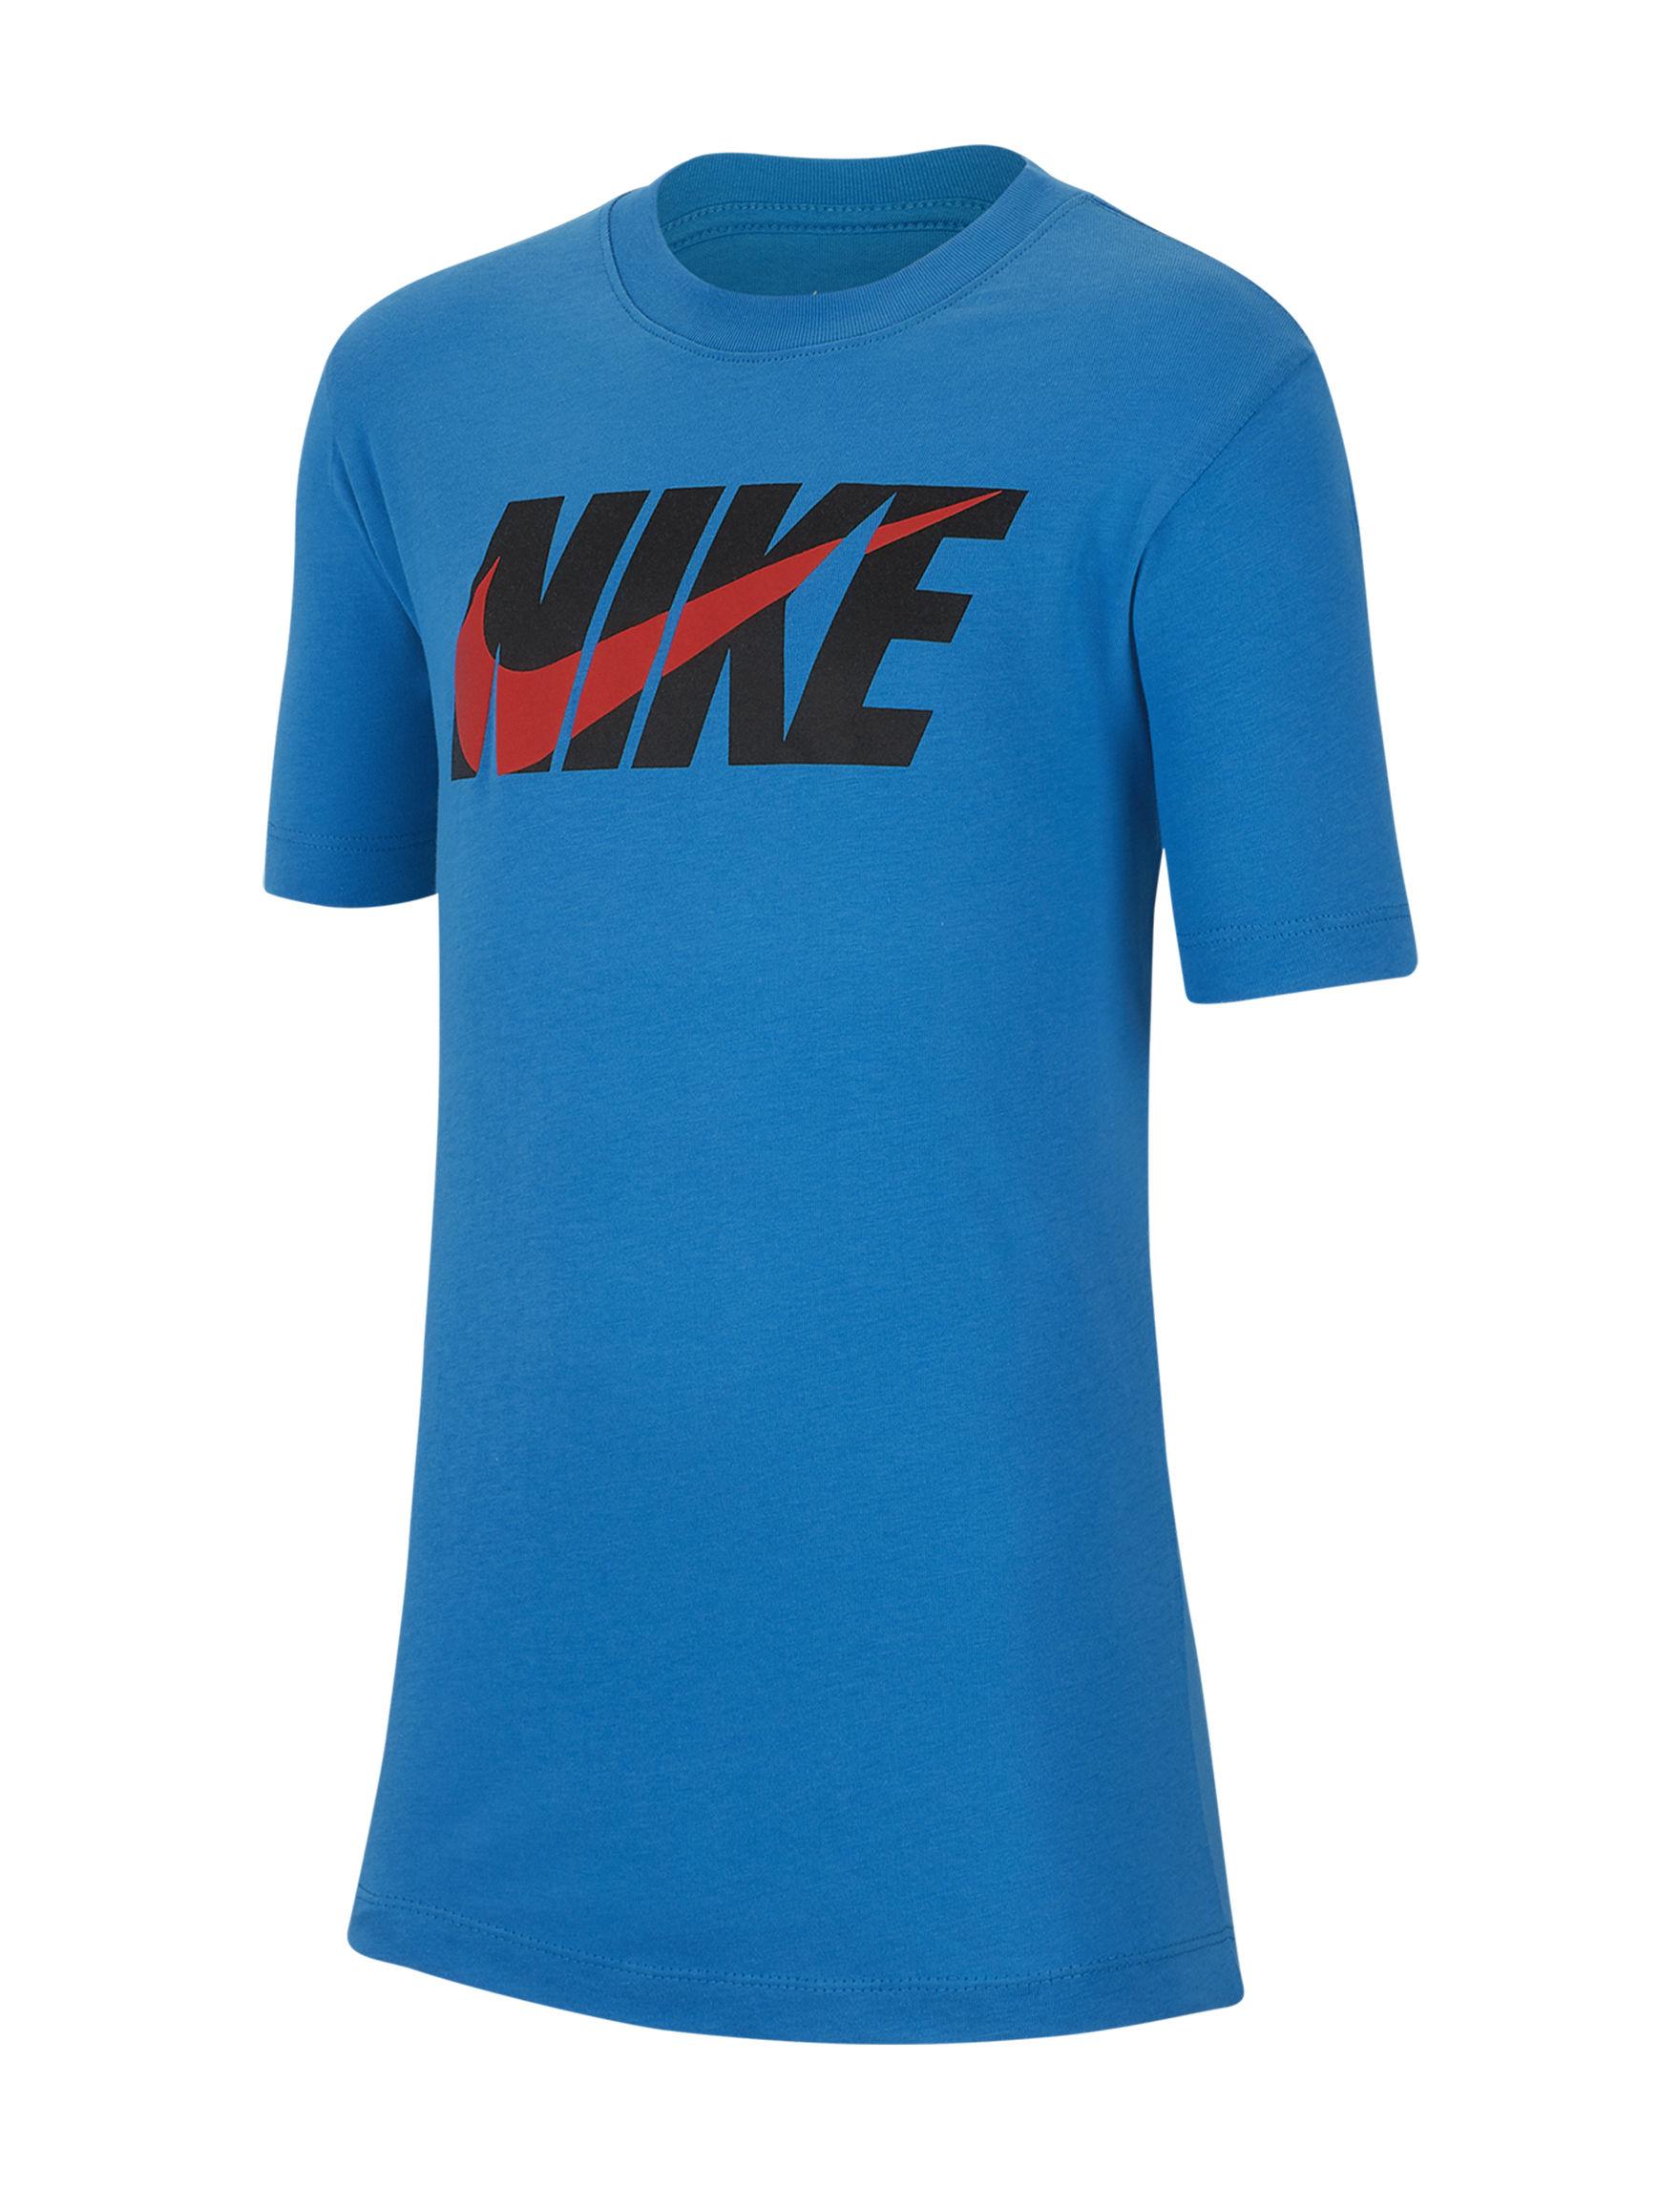 Nike Blue Tees & Tanks